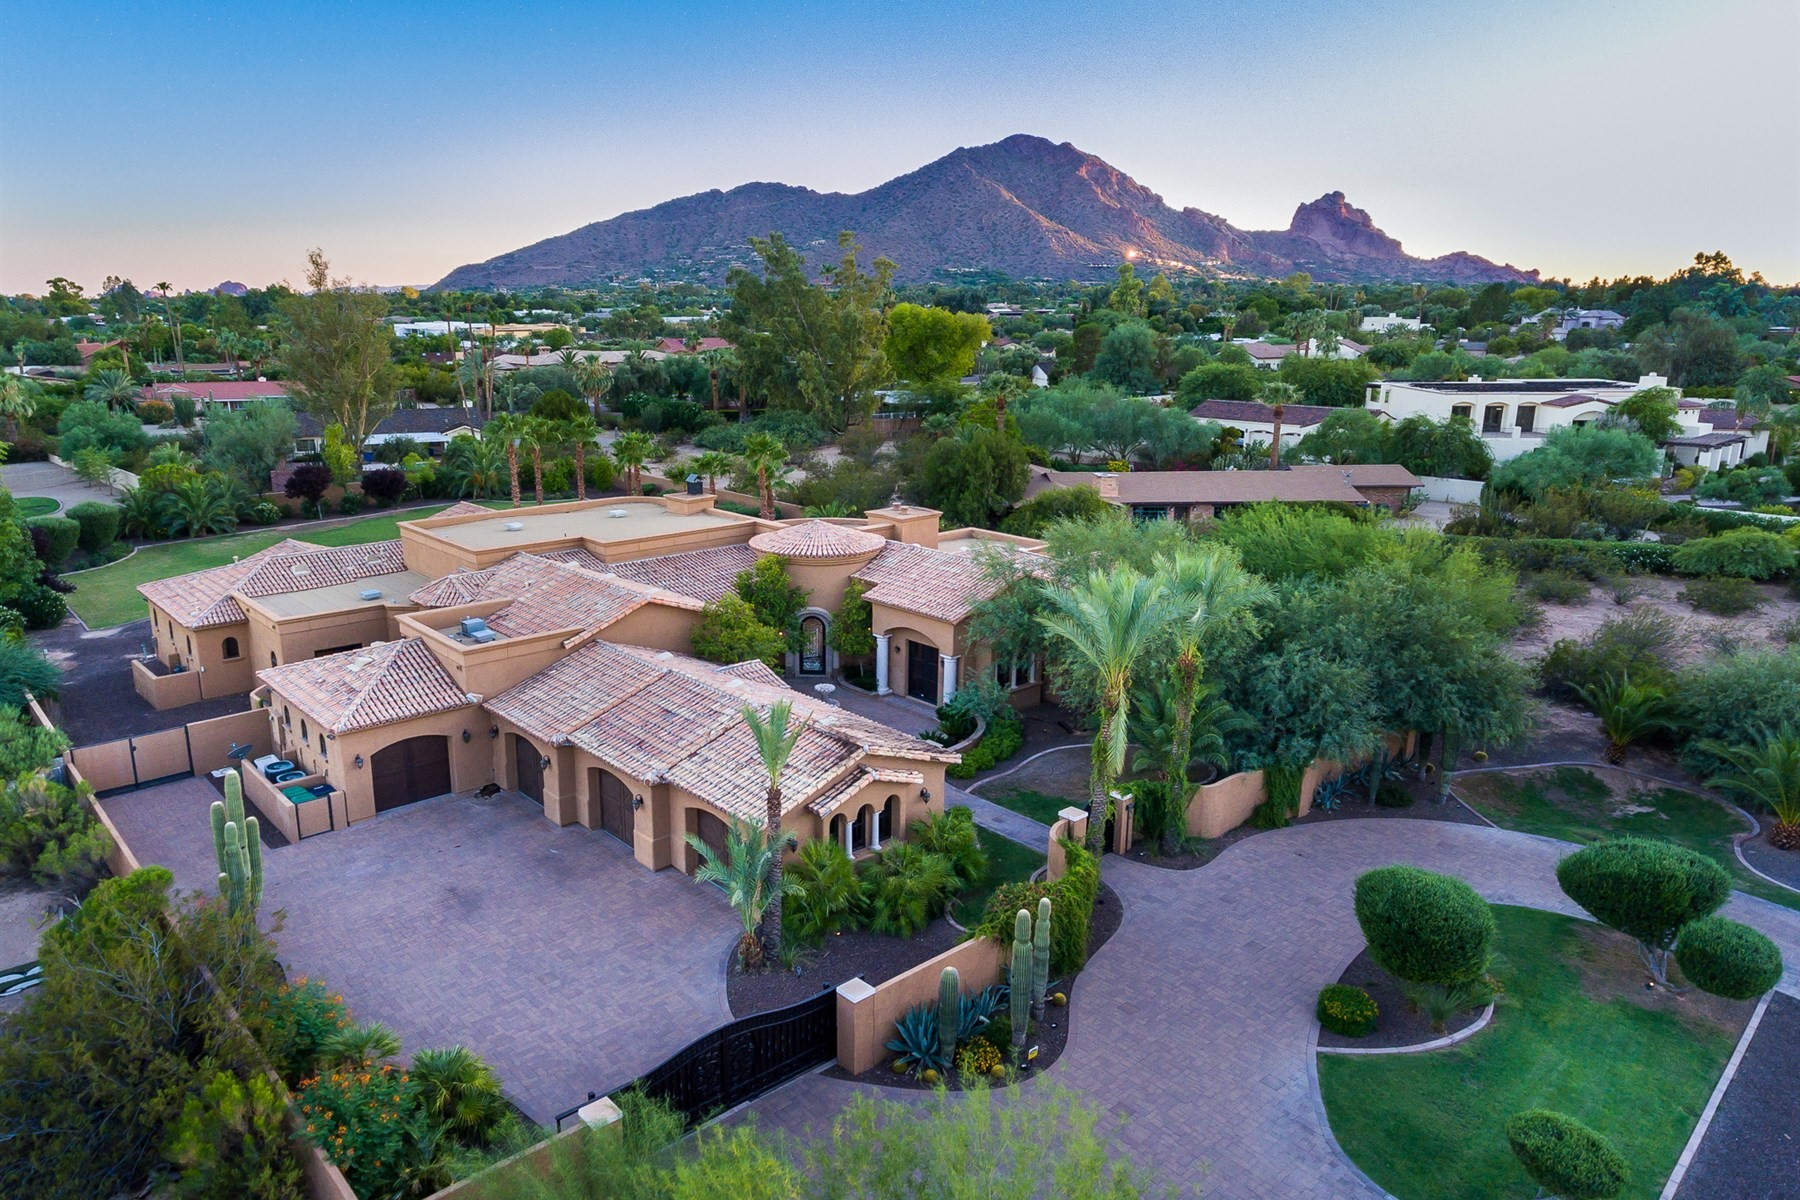 獨棟家庭住宅 為 出售 在 Lovely Paradise Valley home overlooking Camelback Mountain 6720 E Ocotillo Rd Paradise Valley, 亞利桑那州, 85253 美國